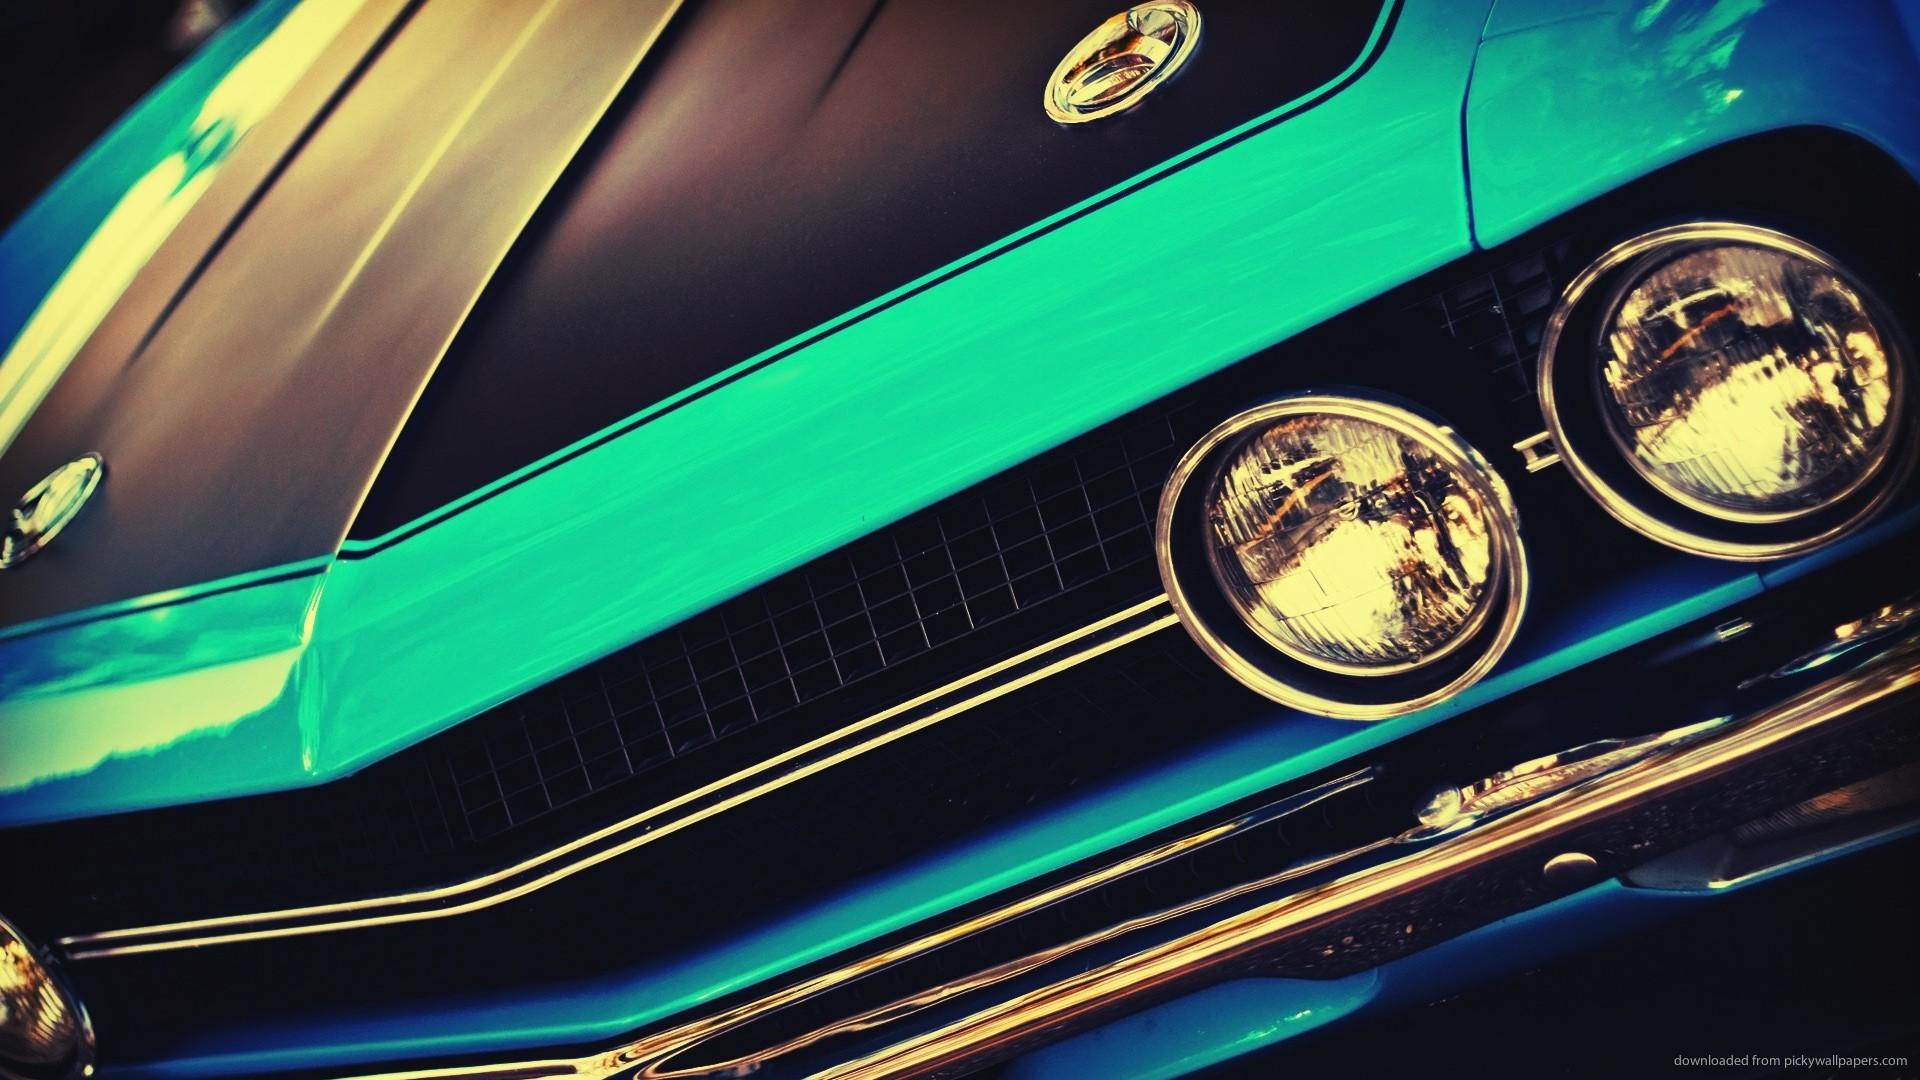 com 1920x1080 cars blue vintage muscle car wallpaper download 1920x1080